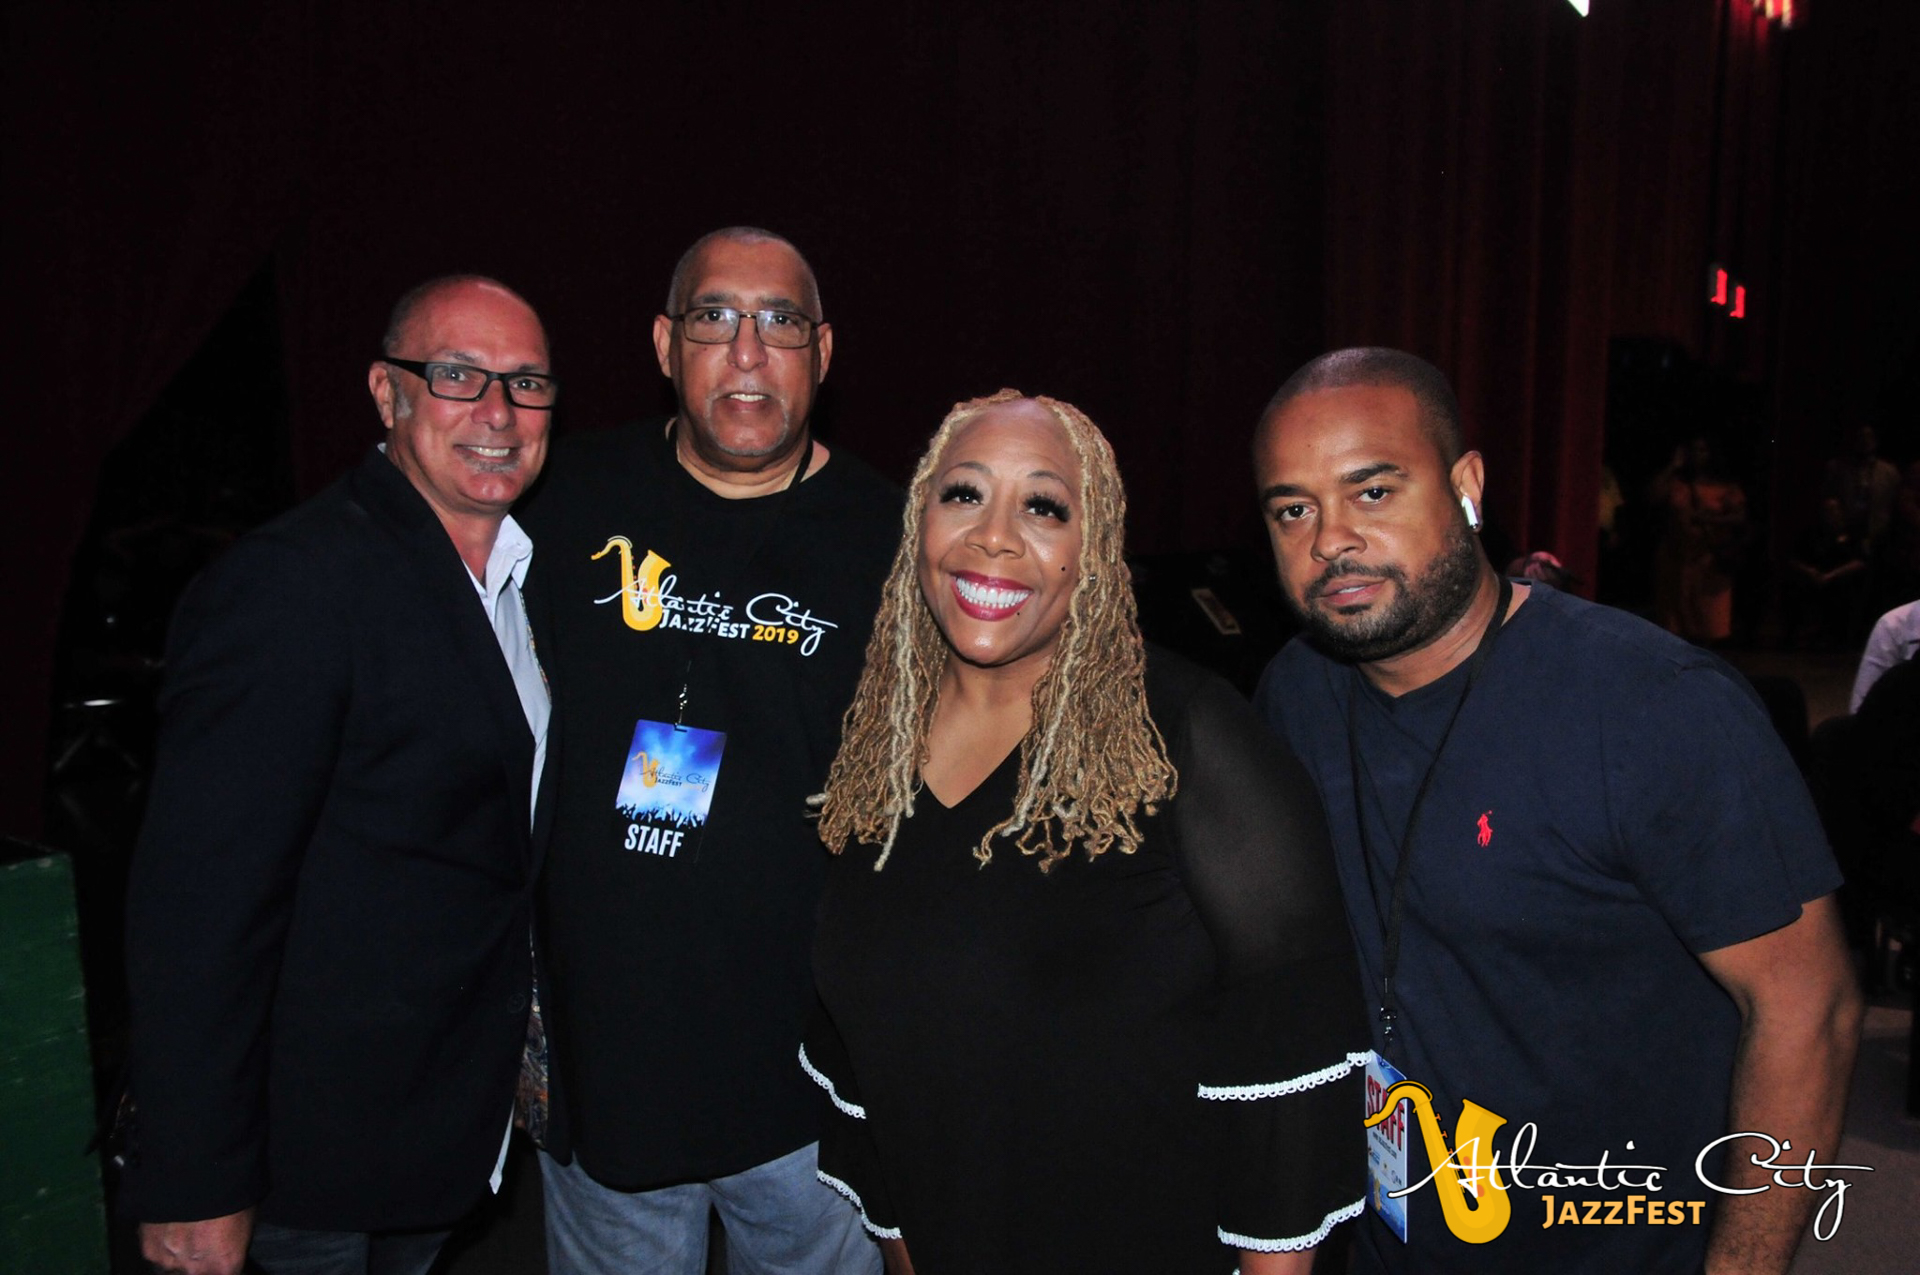 2019 Jazz Fest Picture-67